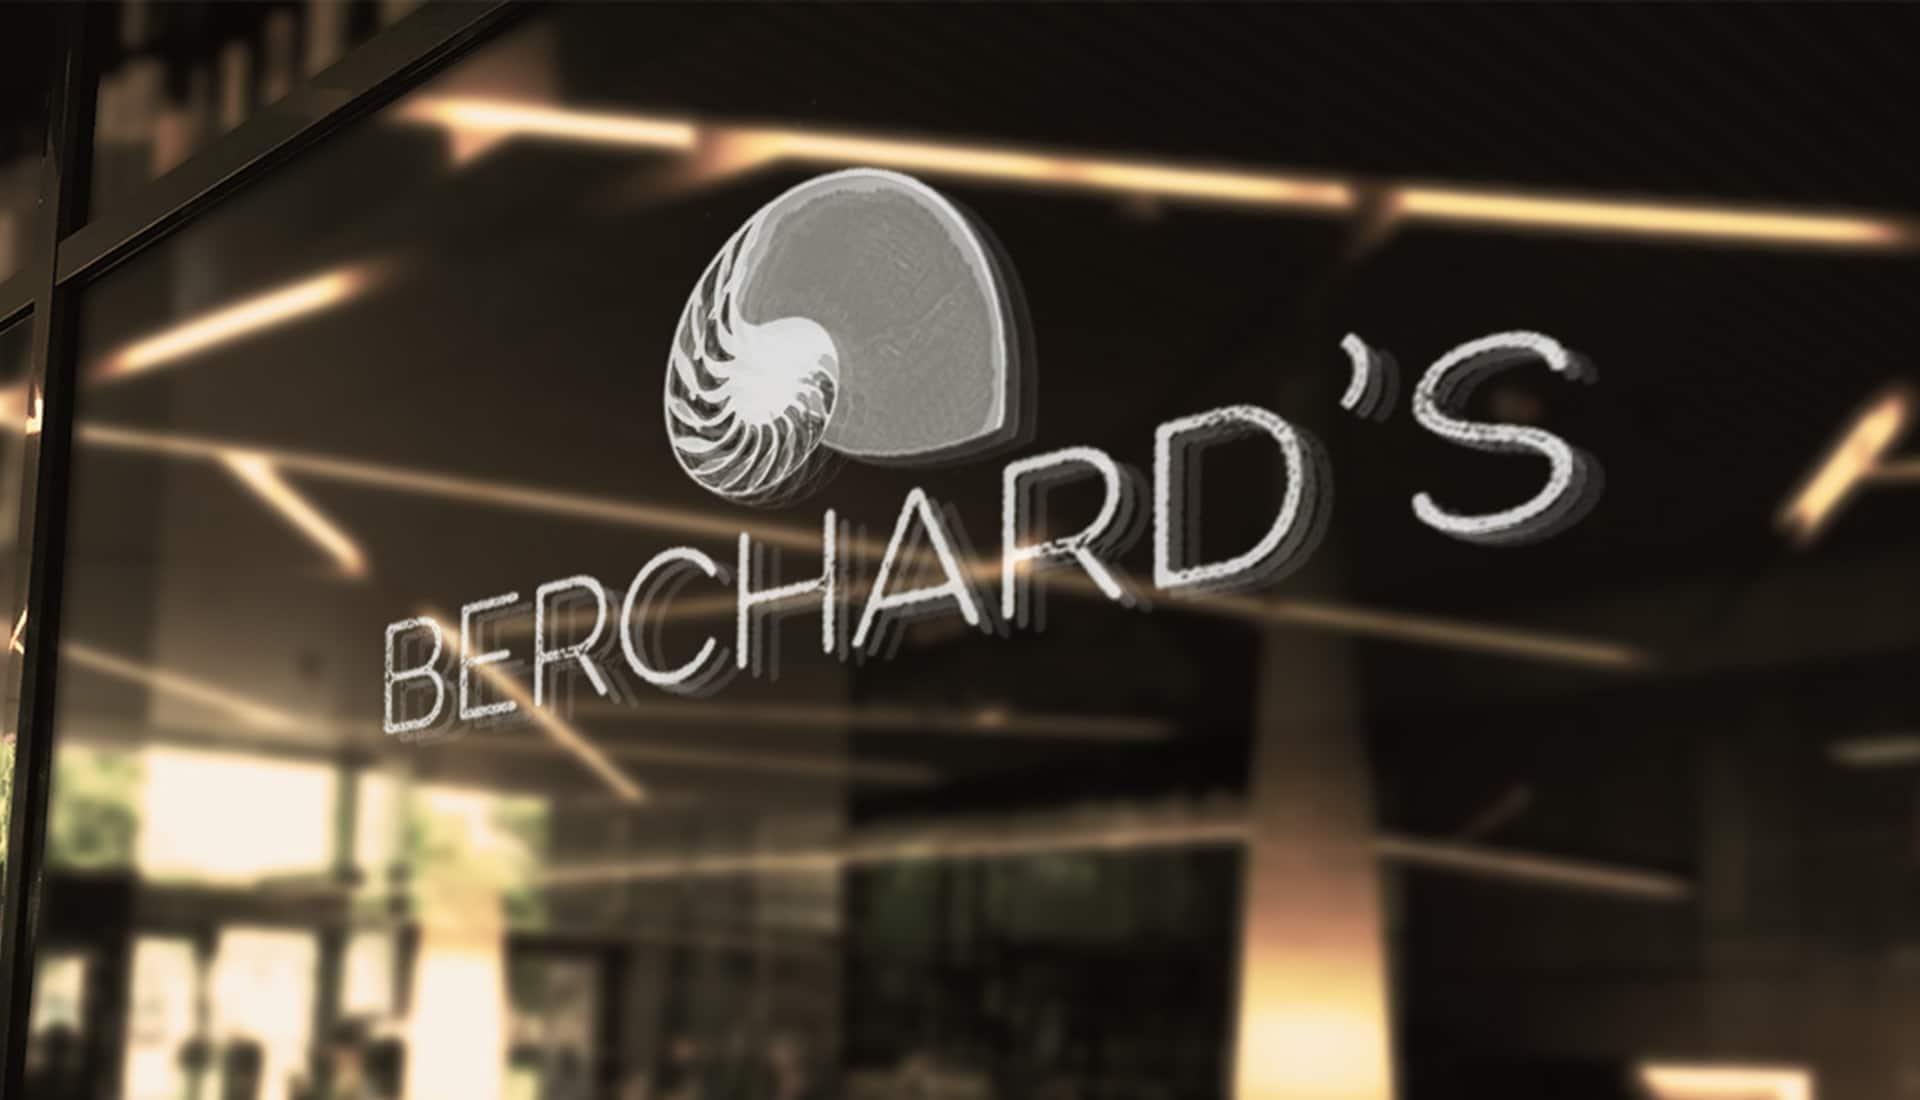 berchards-3